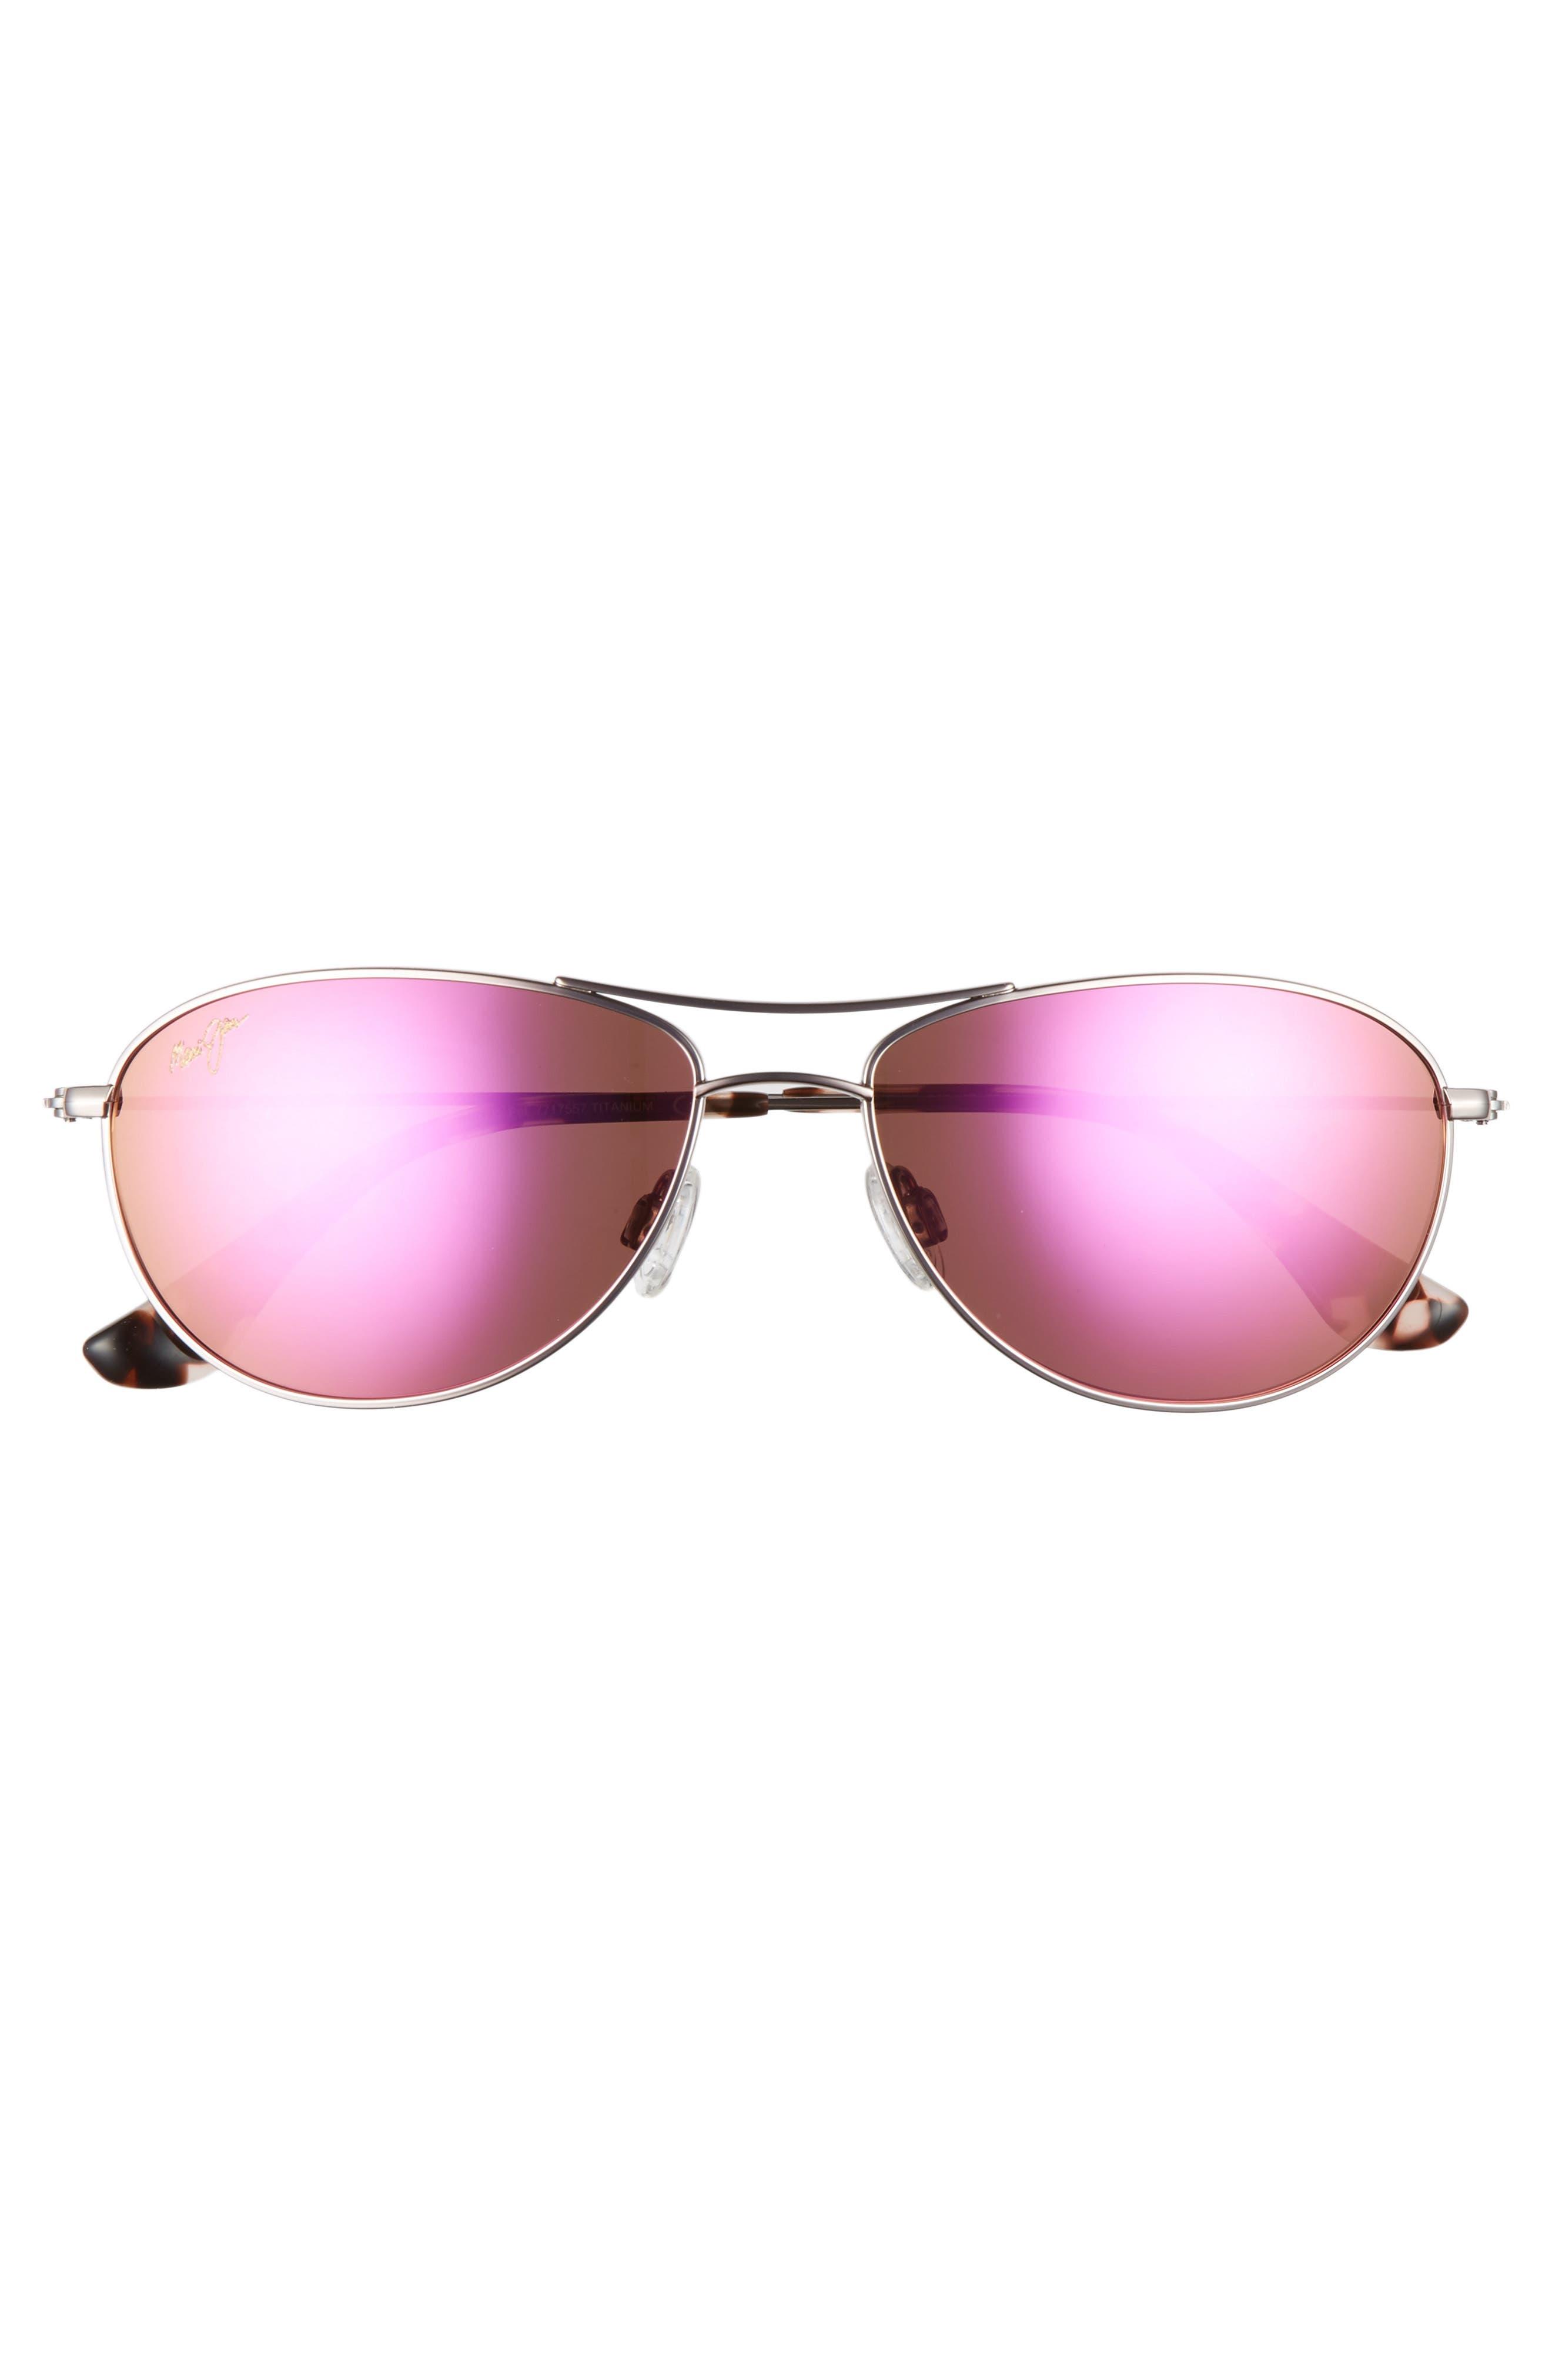 Baby Beach 56mm Mirrored PolarizedPlus2<sup>®</sup> Aviator Sunglasses,                             Alternate thumbnail 3, color,                             ROSE GOLD/ MAUI SUNRISE